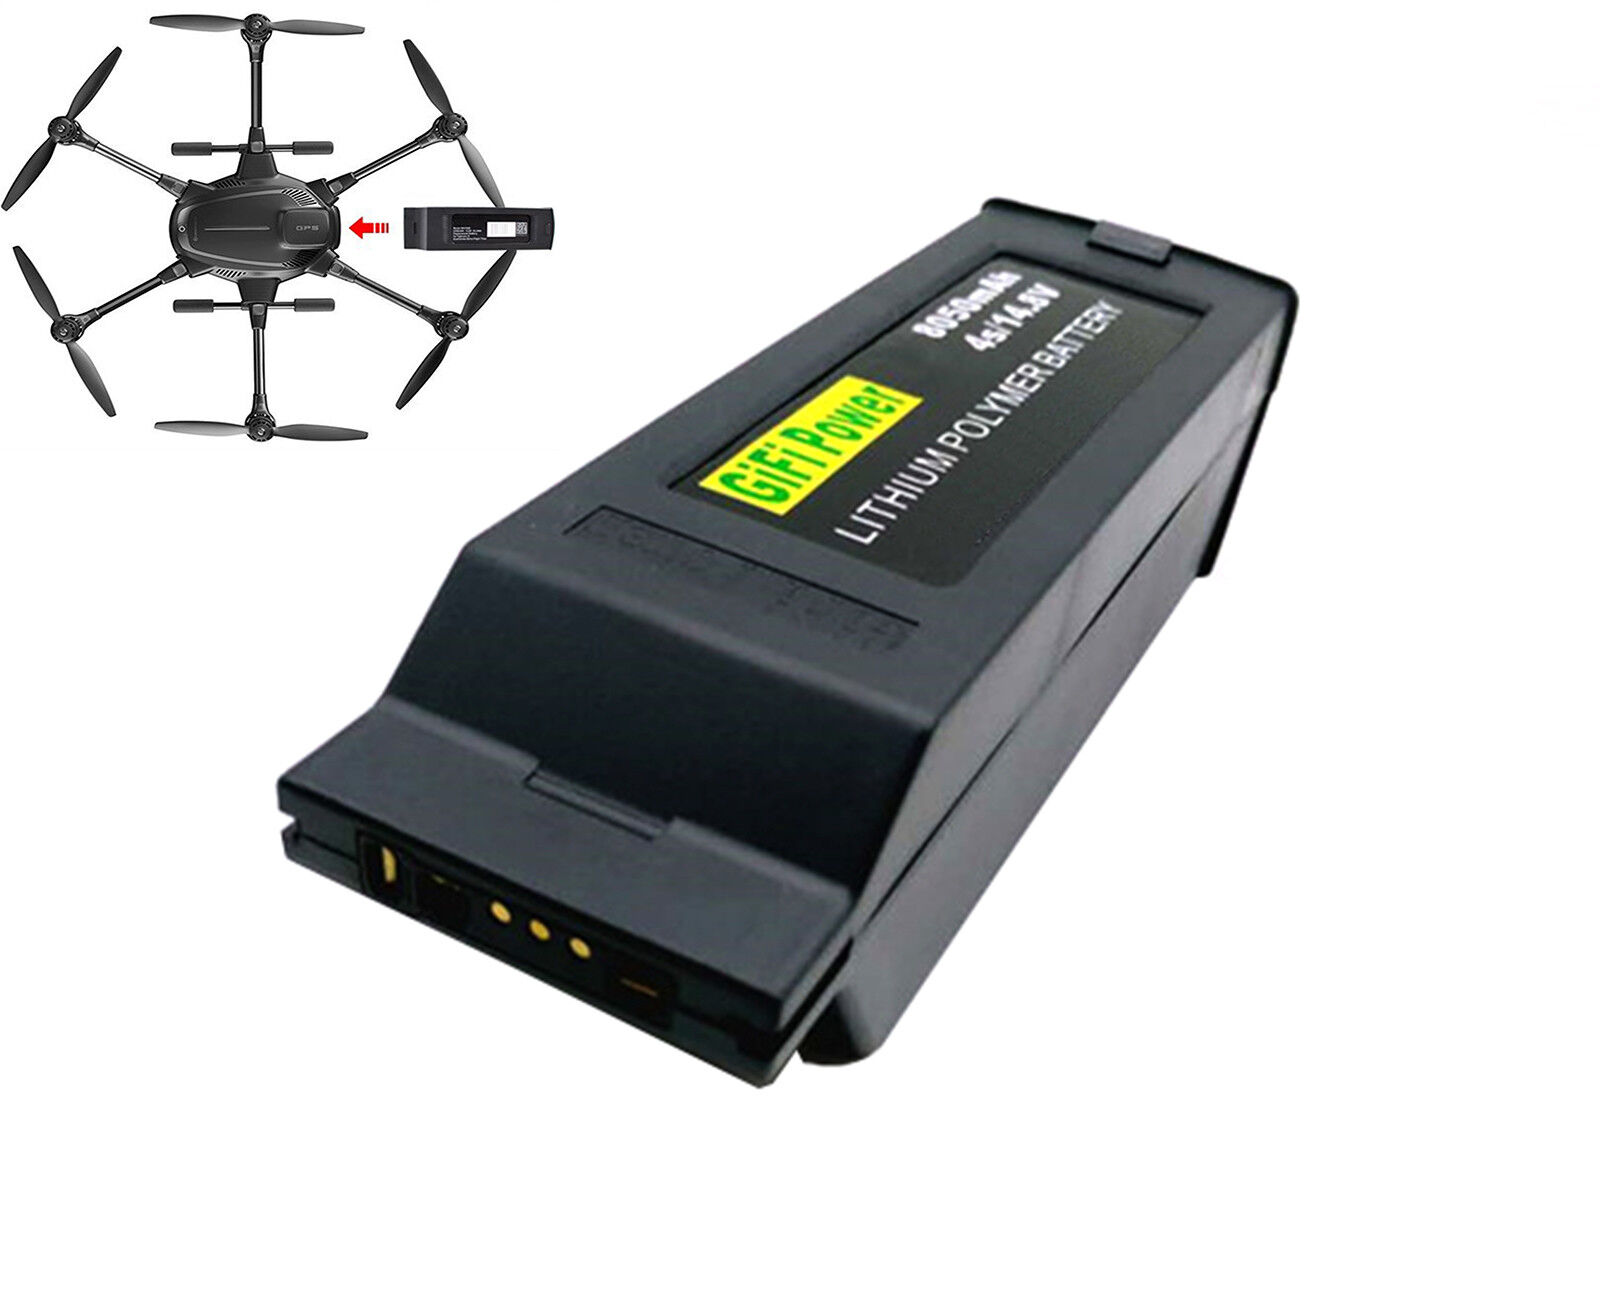 Max 8050mah 14.8v ersatz lipo batterie 4s1p fr yuneec taifun h drohne